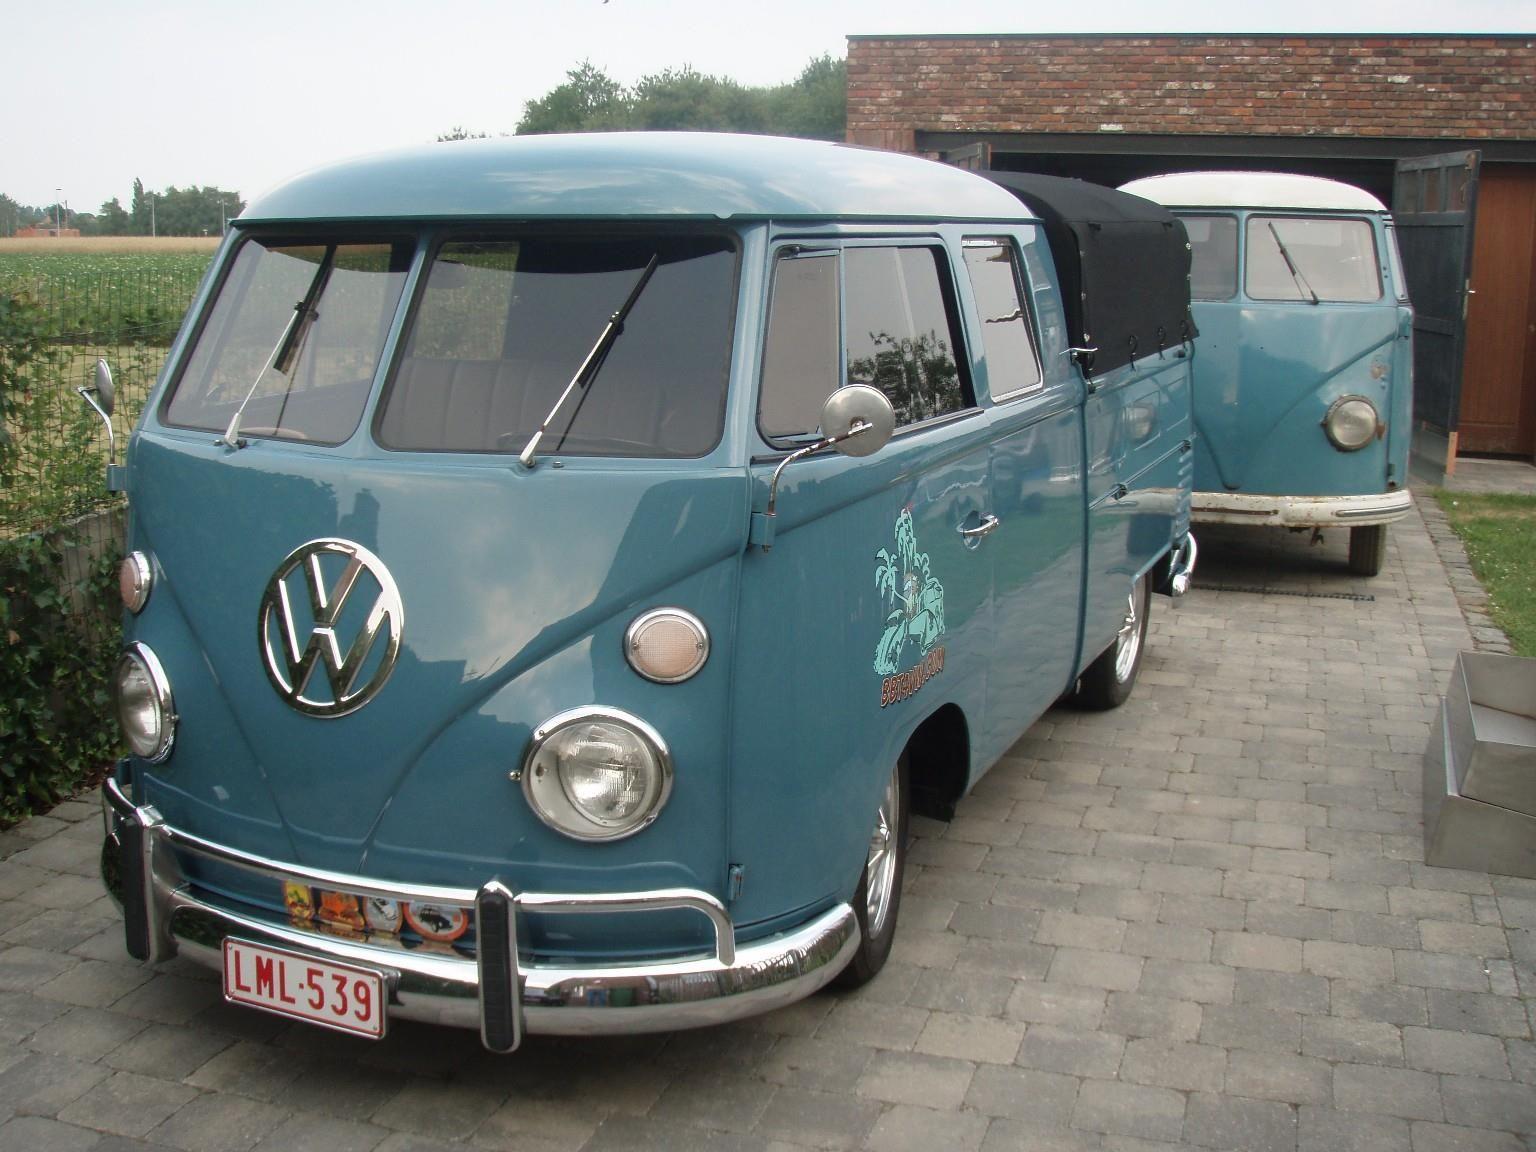 t1 vw bus double cab pick up vintage vw bus model t1 and t2 pinterest vw bus. Black Bedroom Furniture Sets. Home Design Ideas